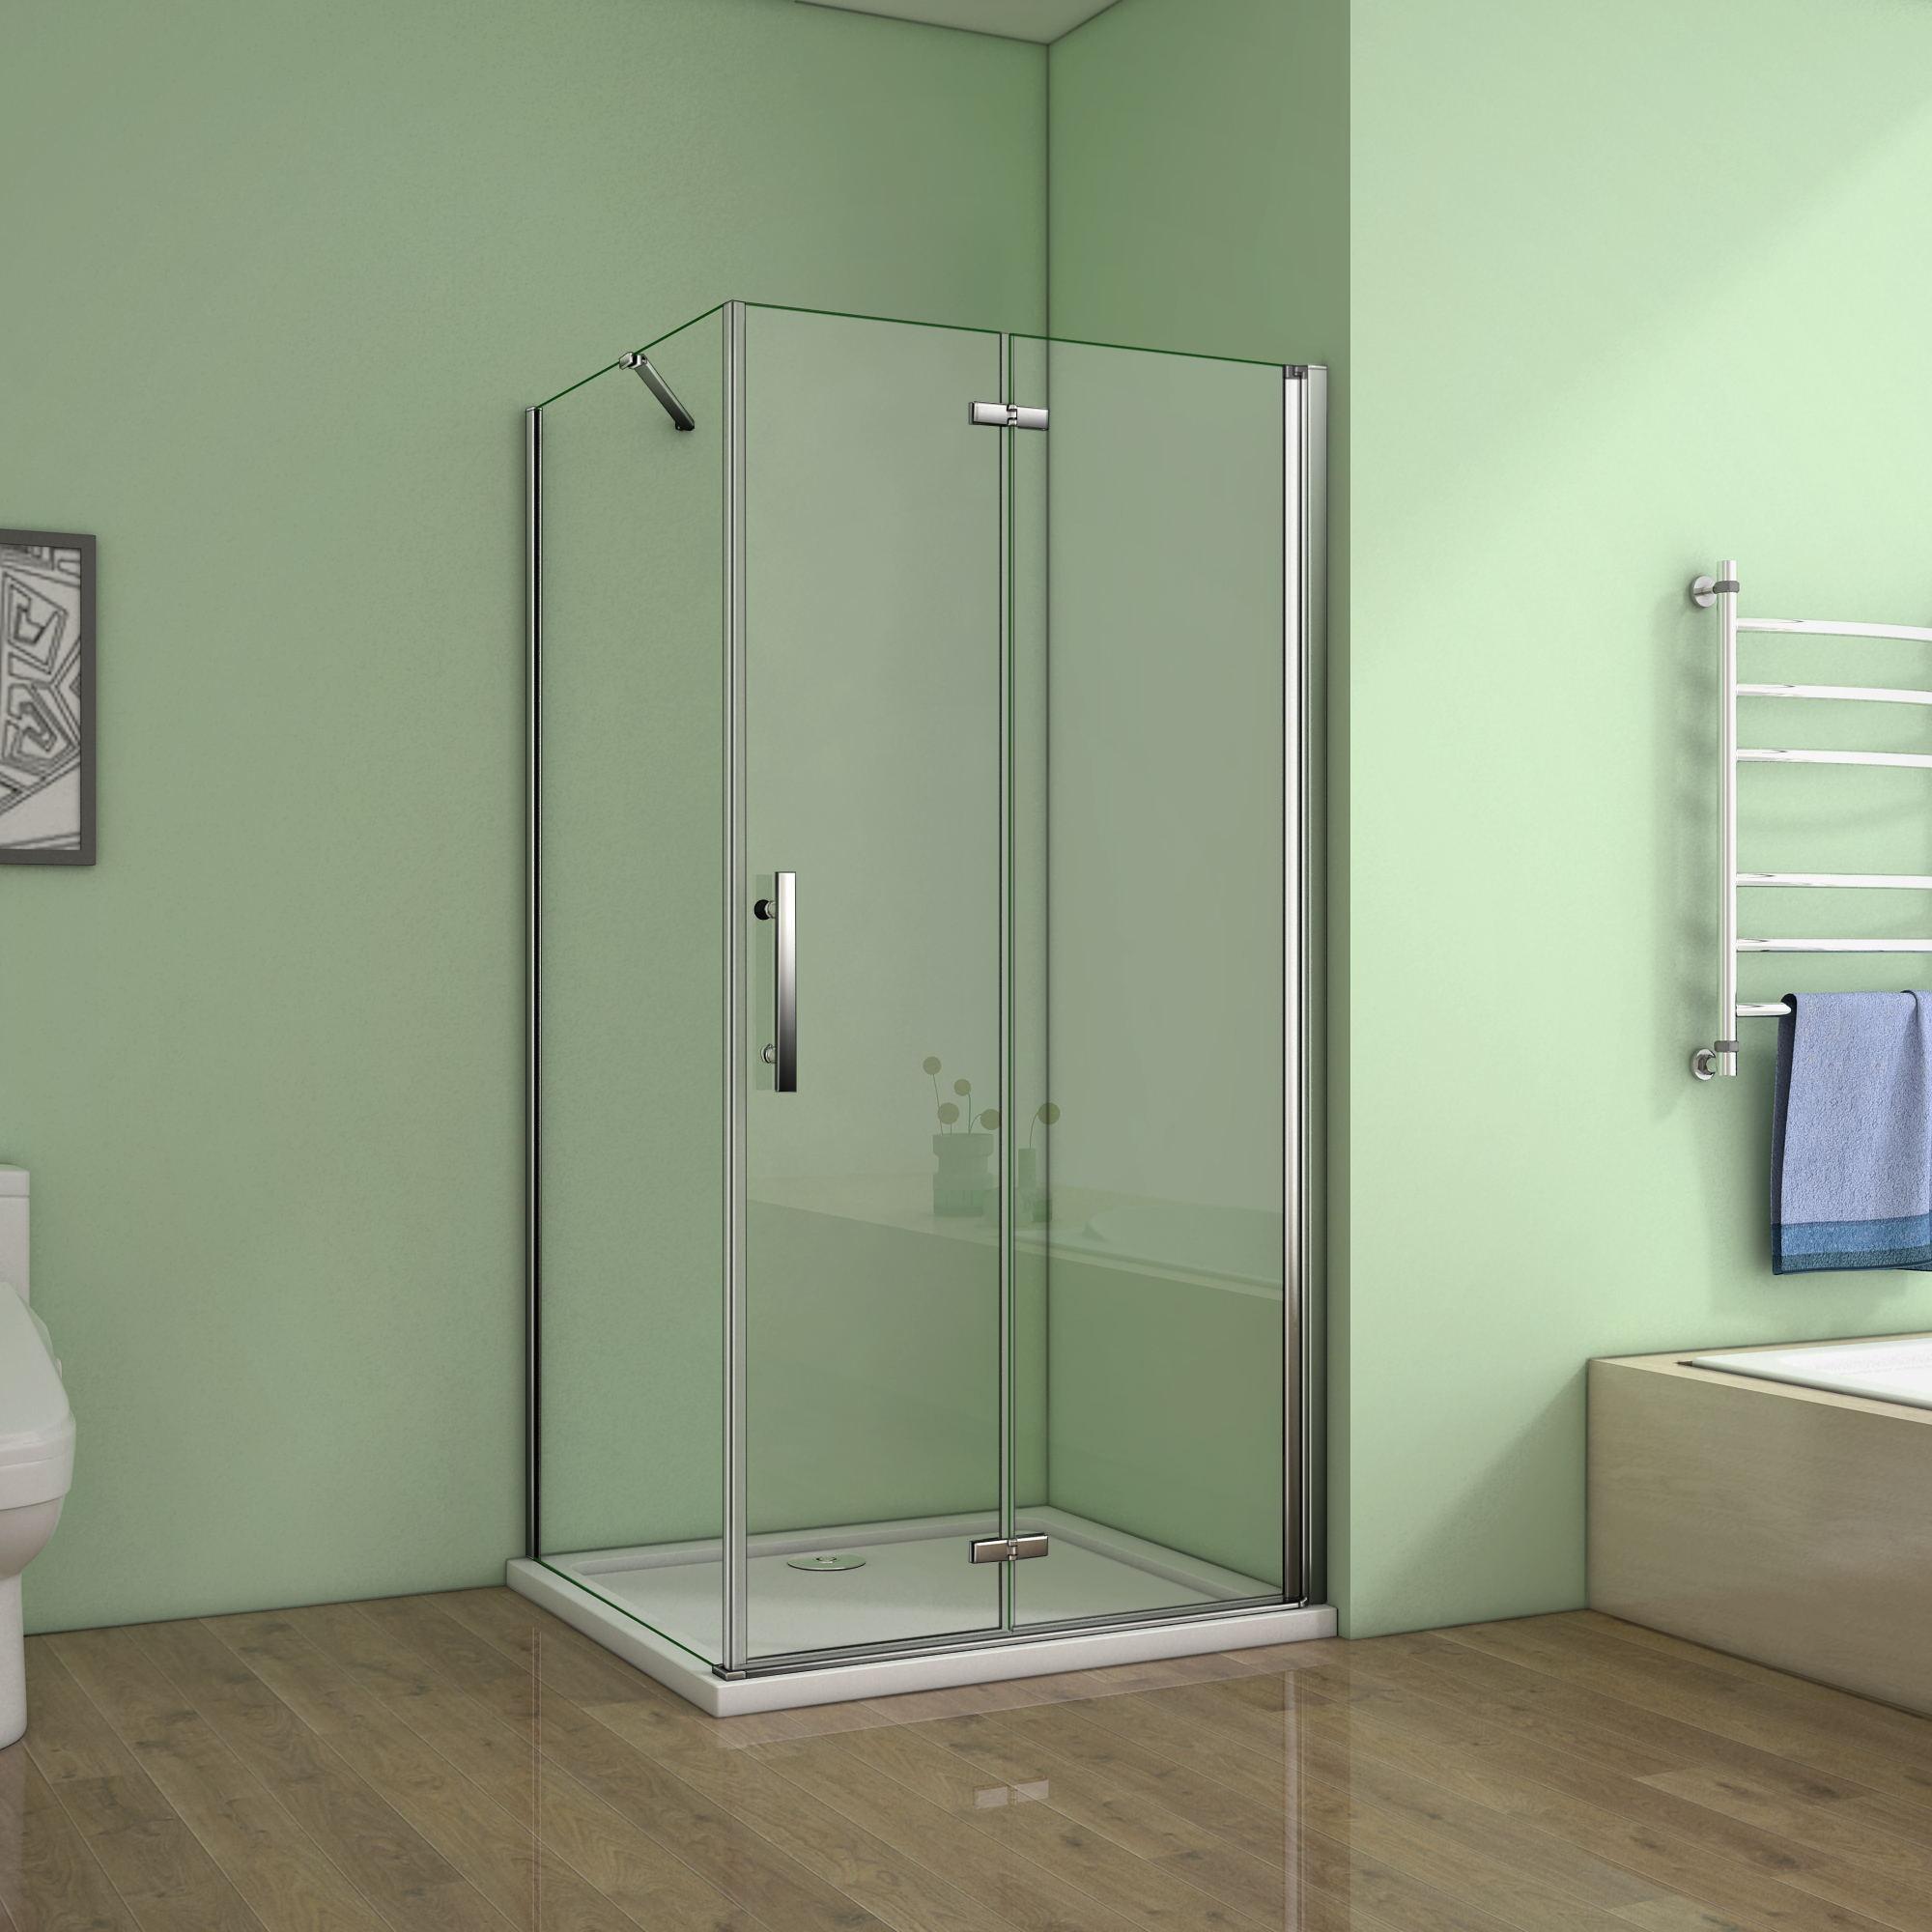 Frameless Pivot Bi Fold Hinge Shower Enclosure Glass Cubicle Door Panel Tray Hpw Ebay